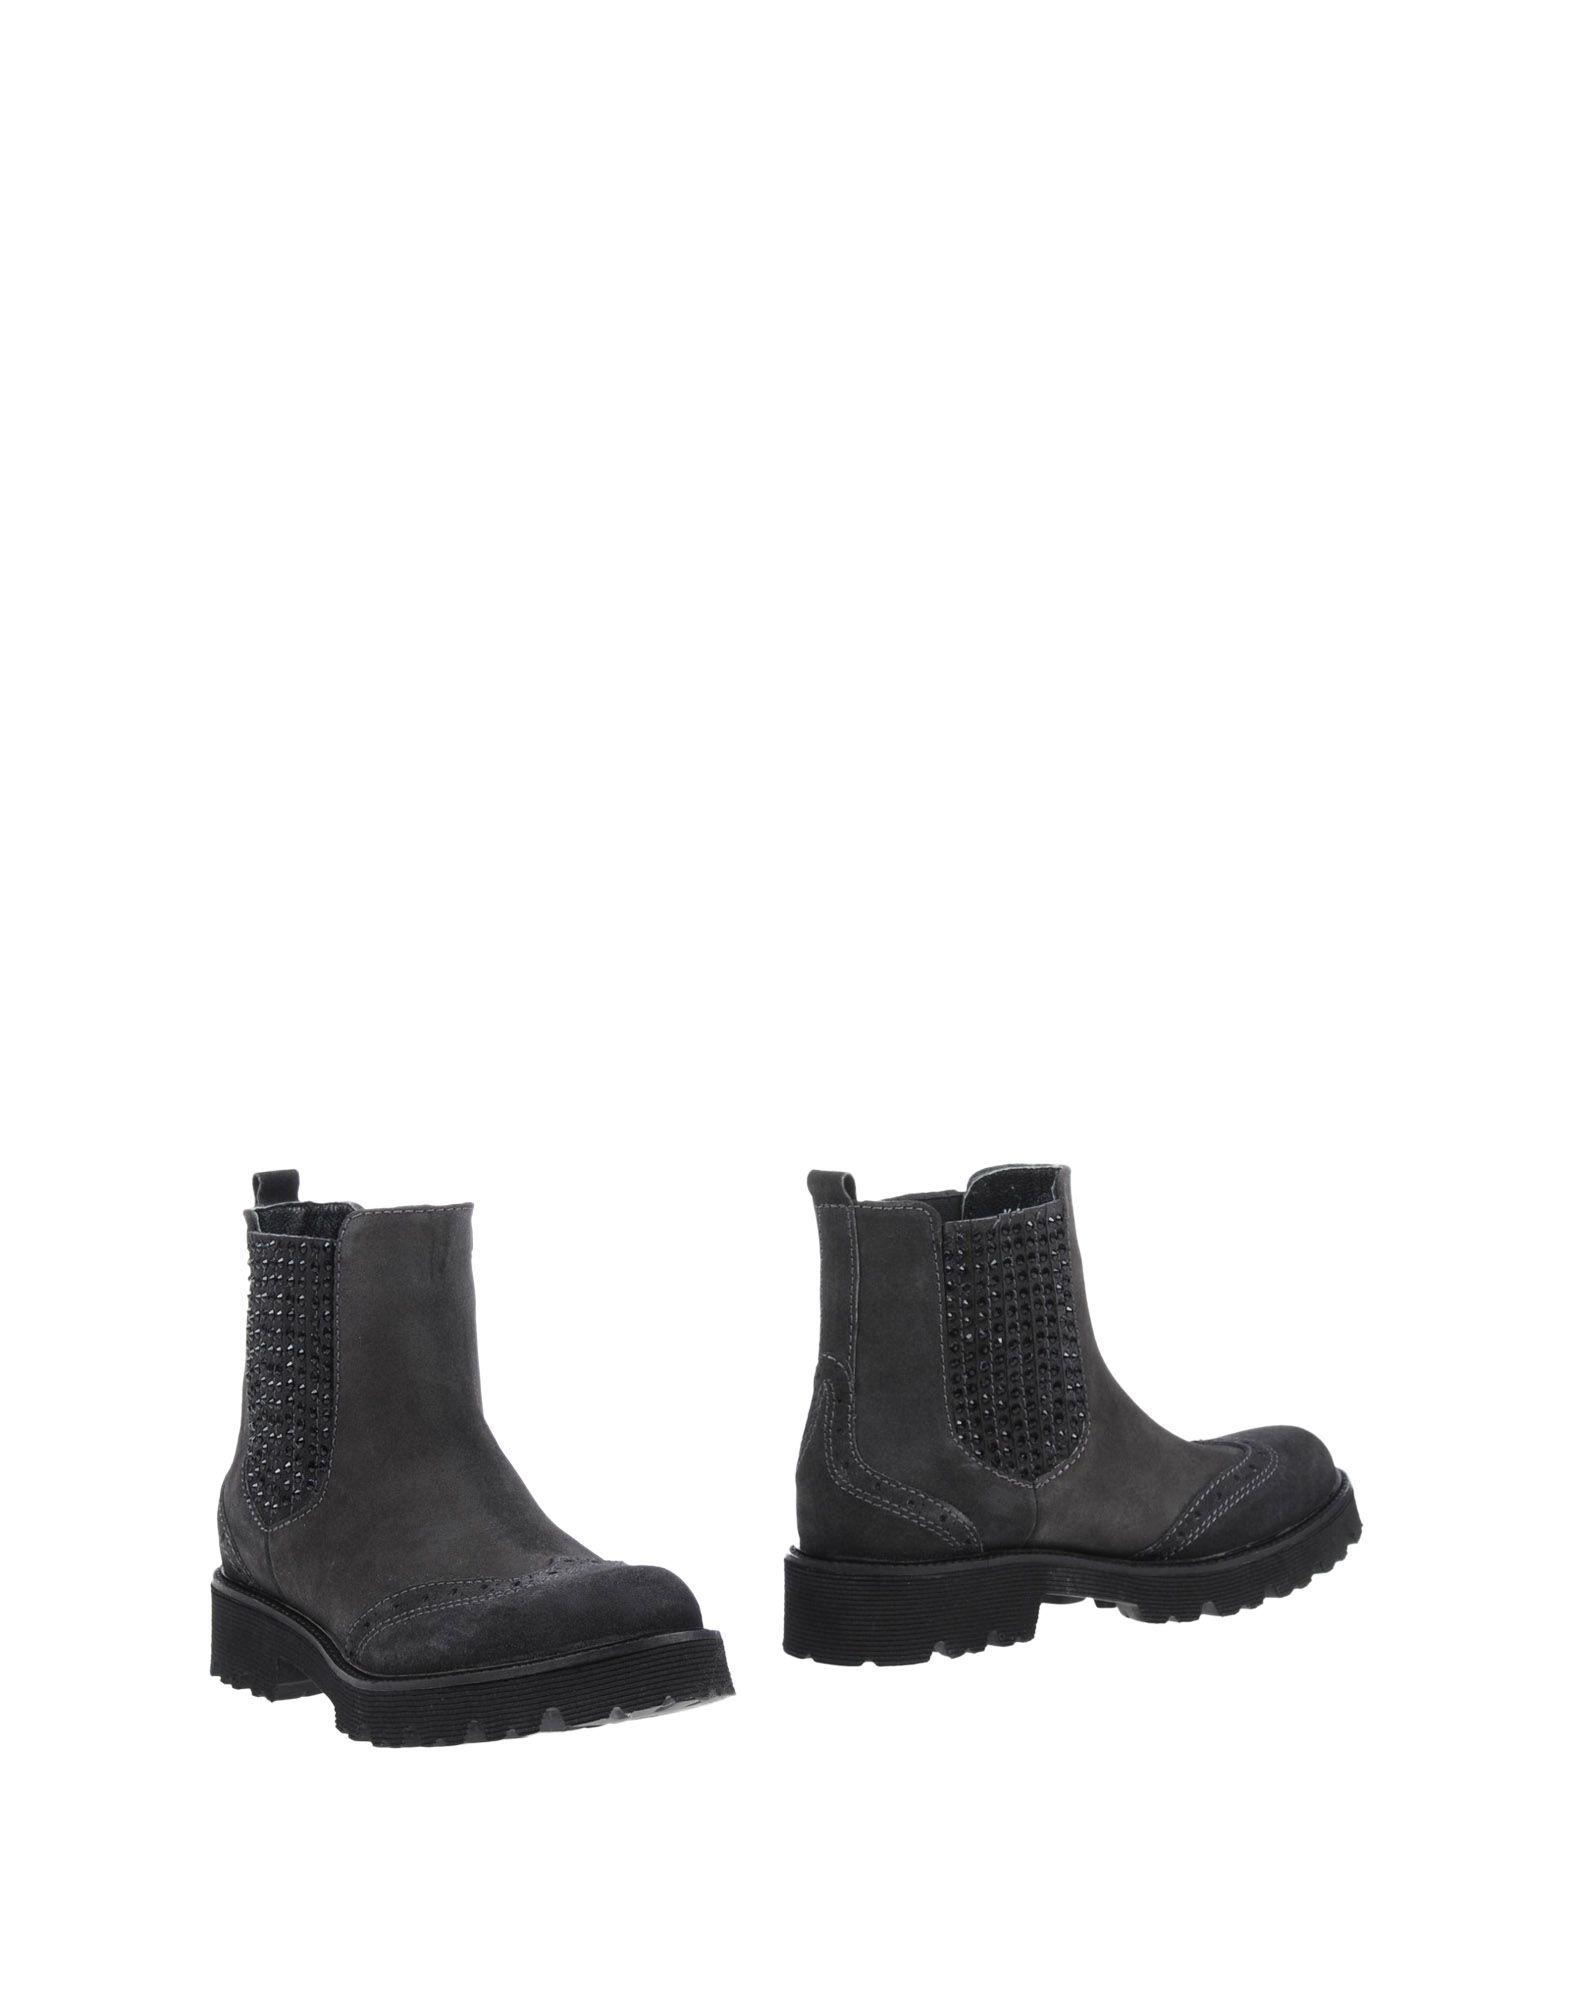 CARPE DIEM Ankle boot Steel grey Women